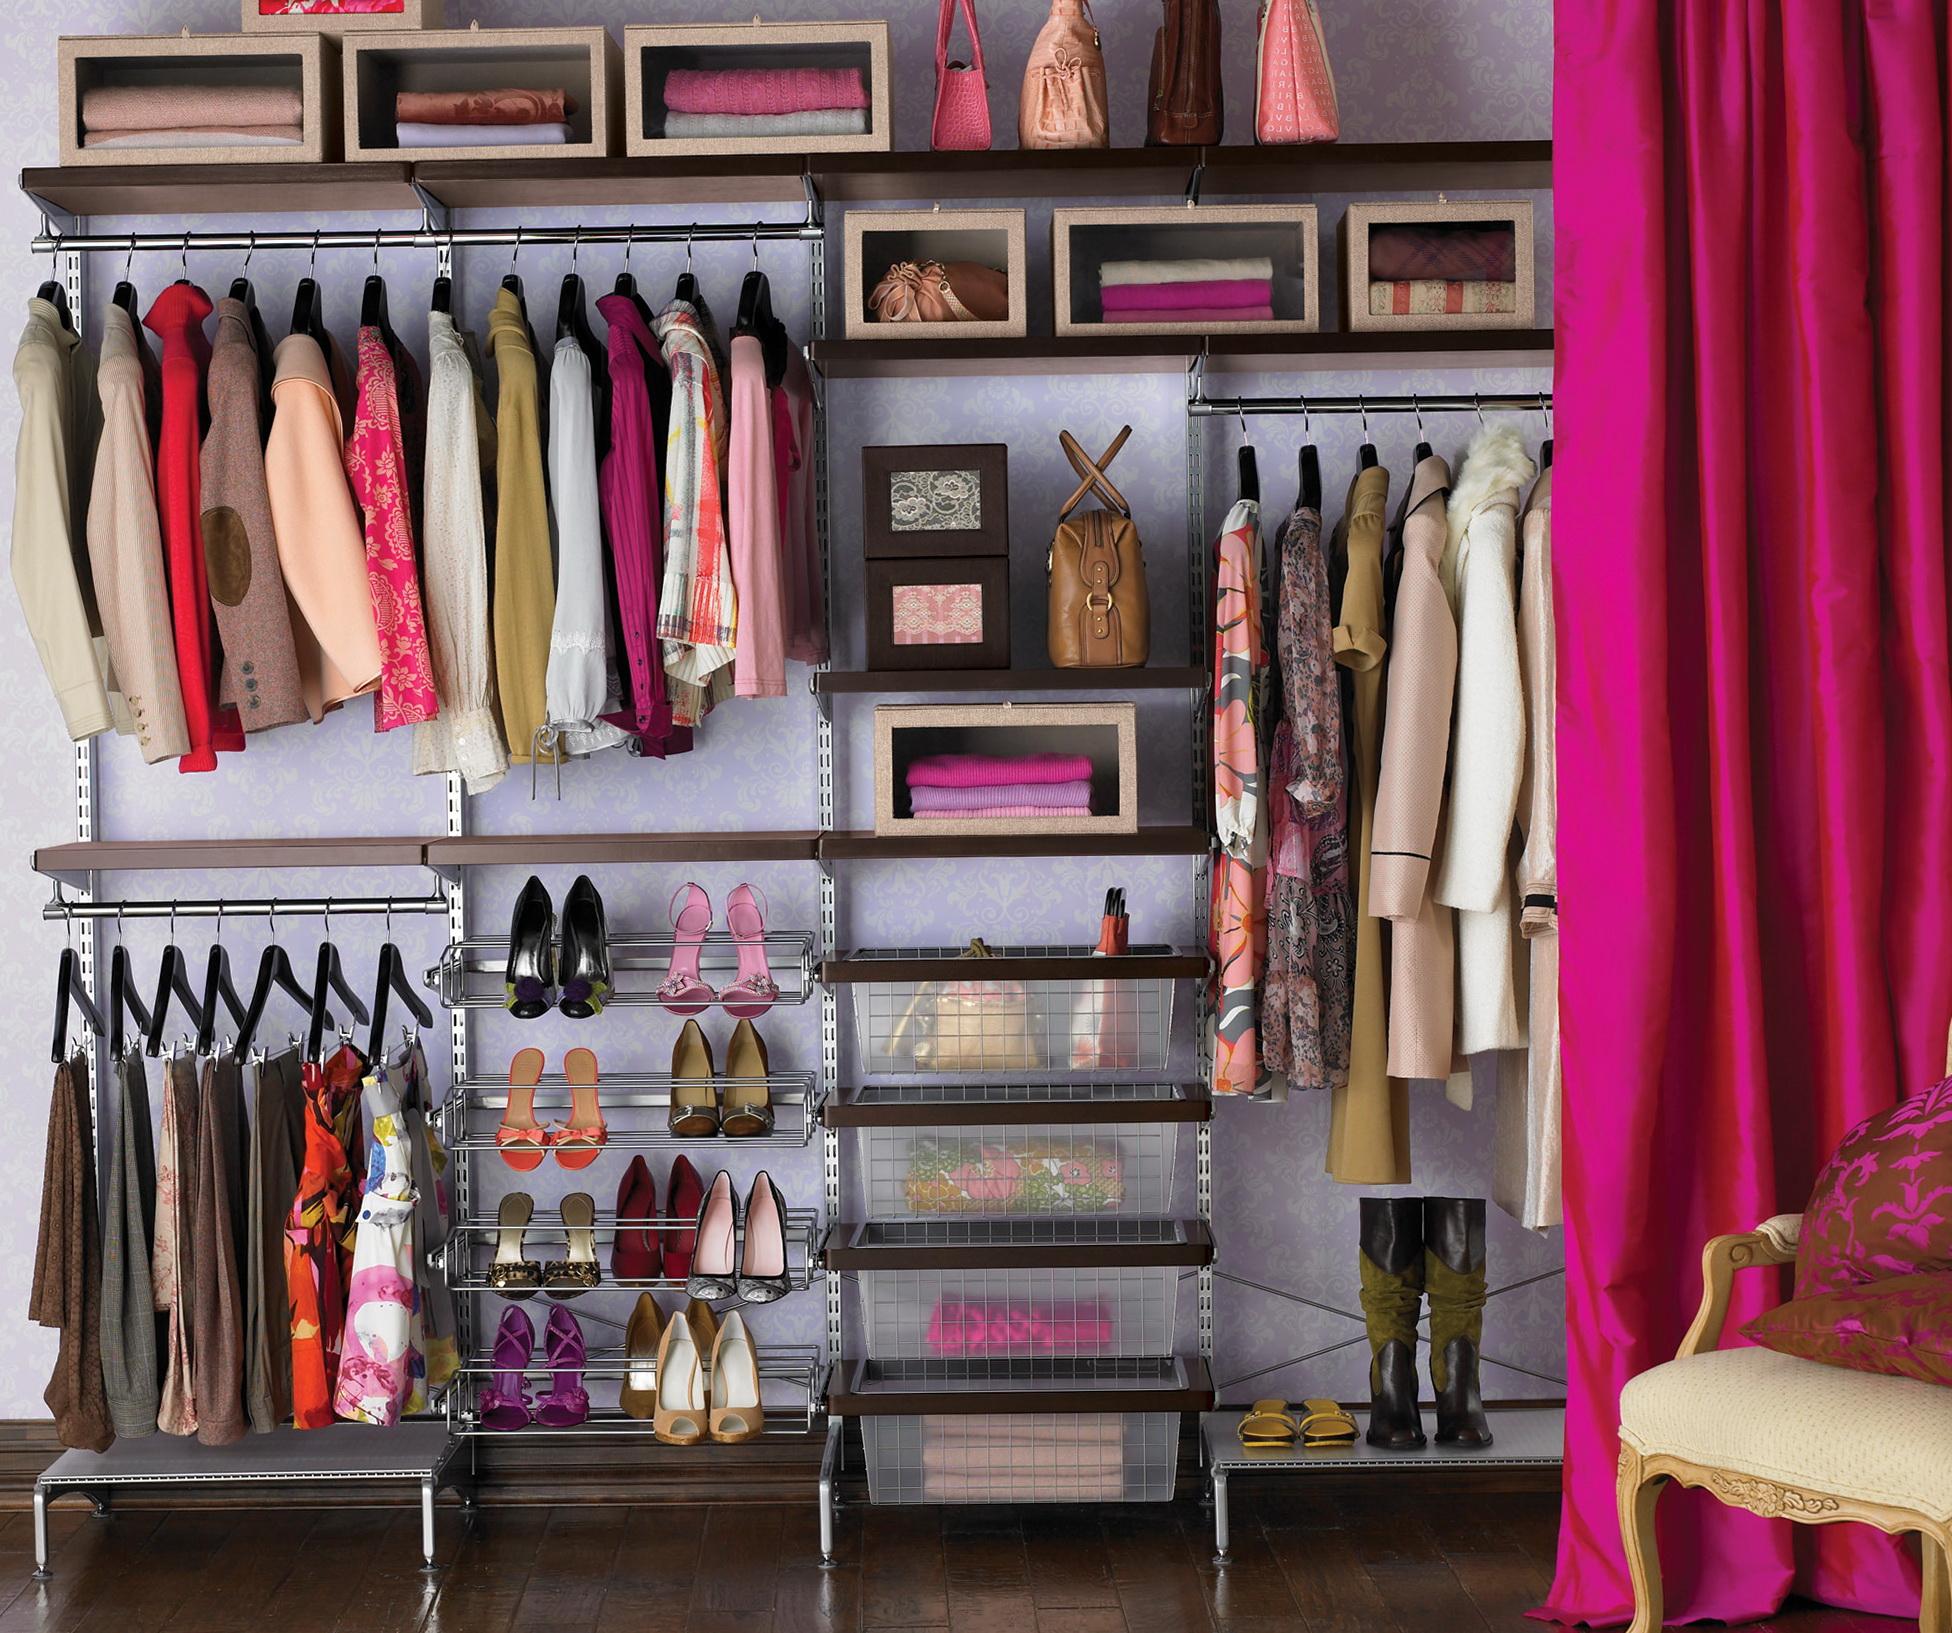 Closet Ideas Small Decorating: Super Small Walk-in Closet Ideas & Tips